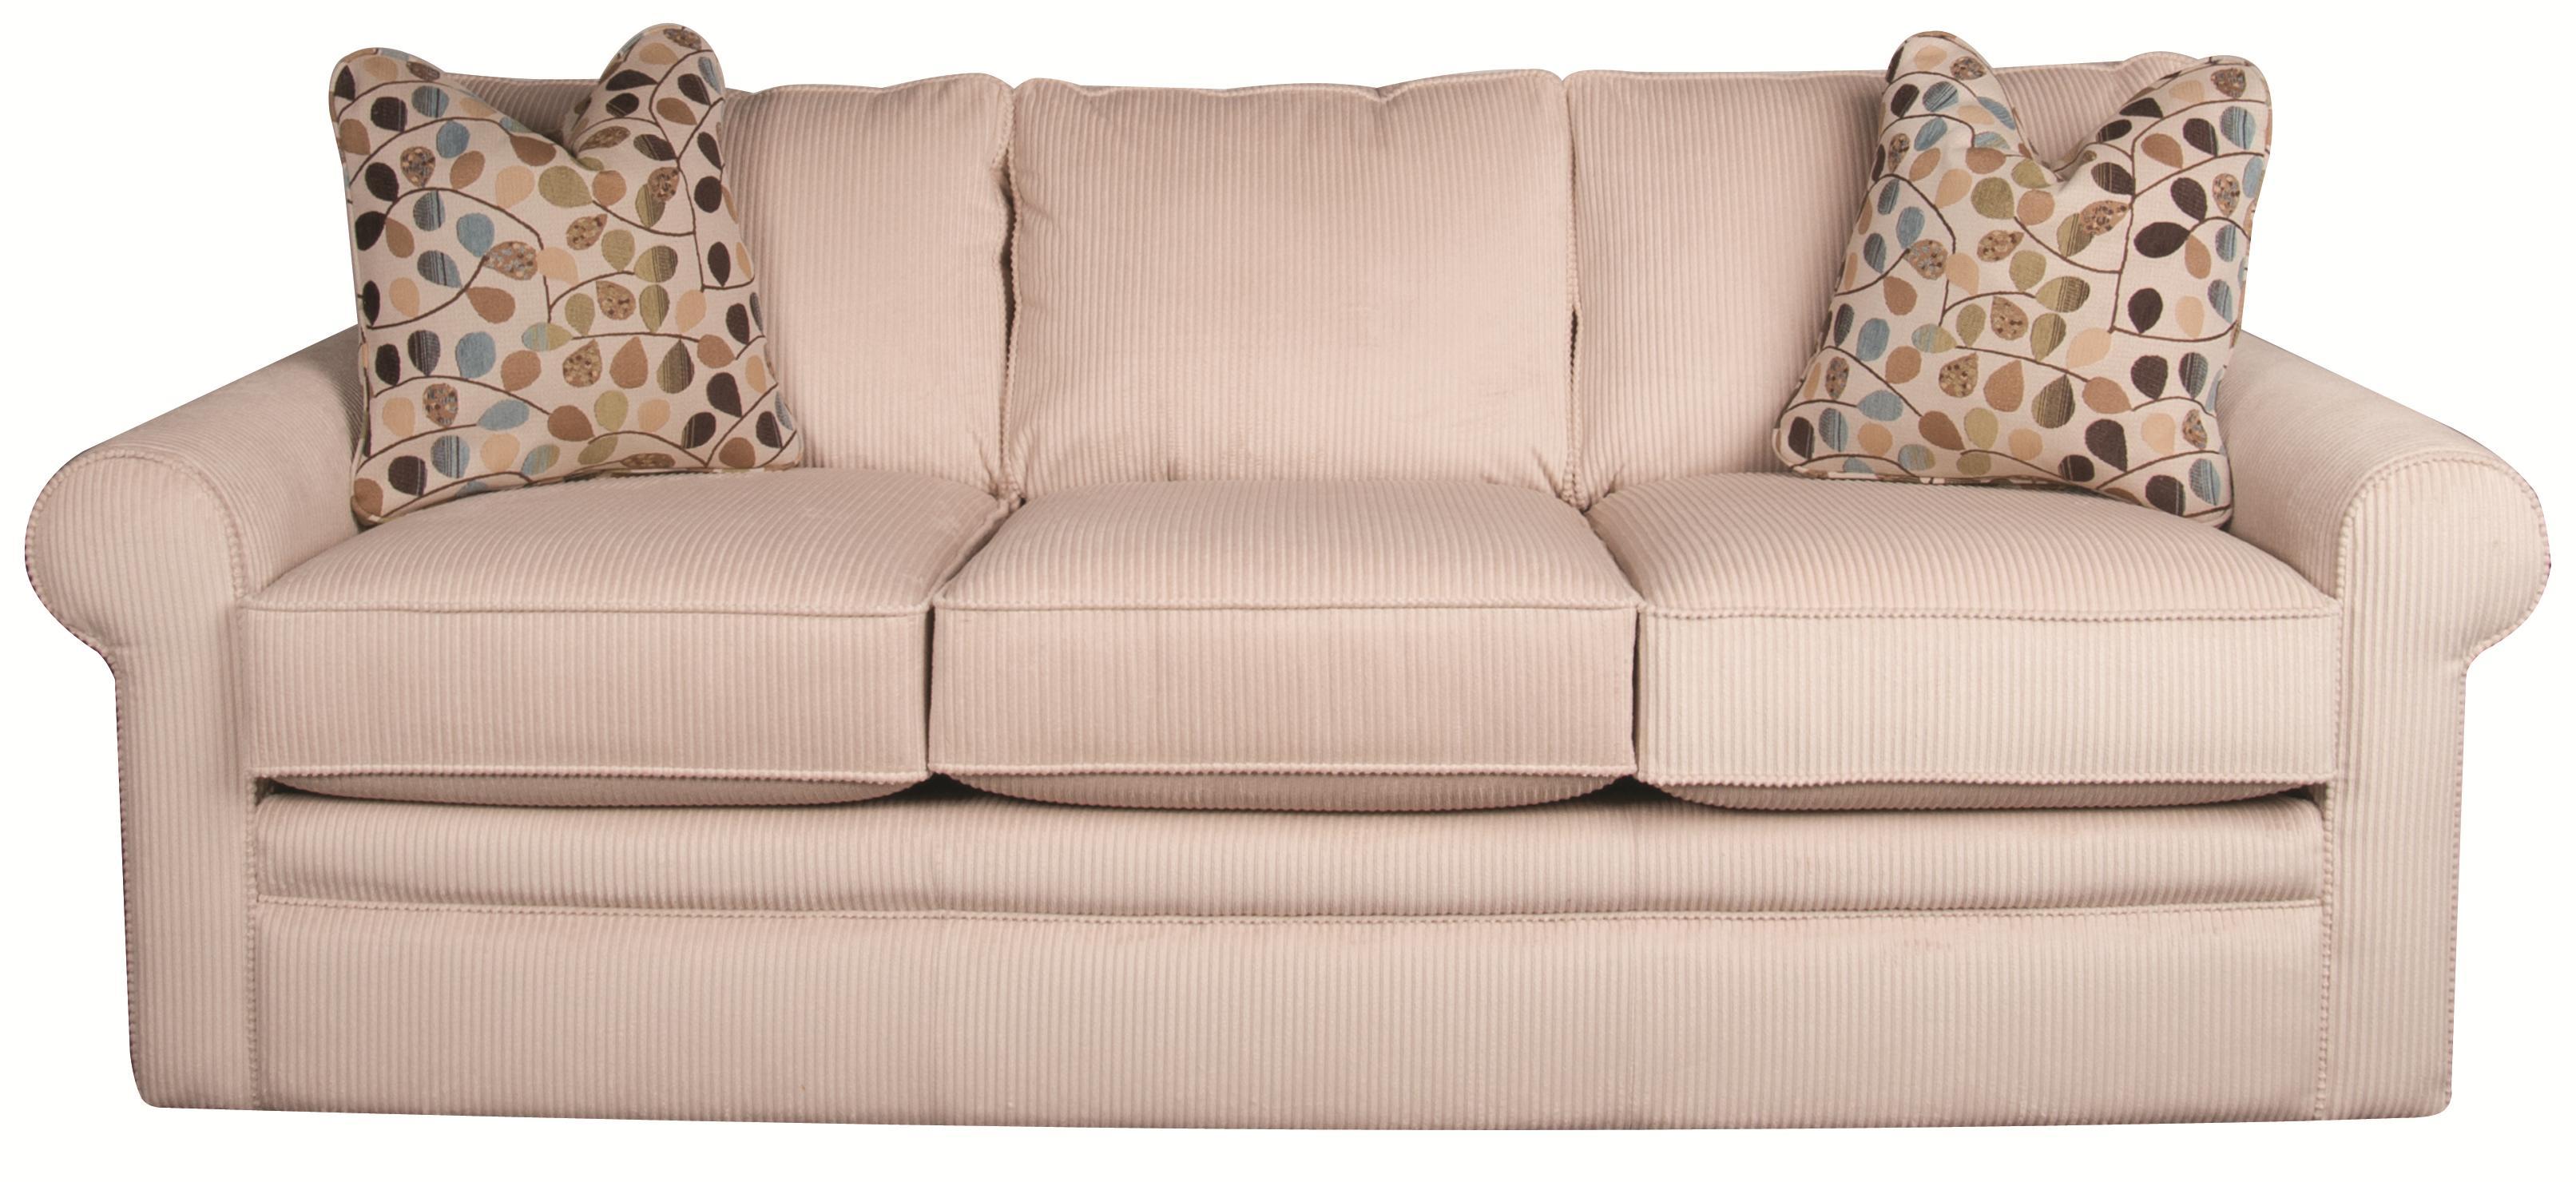 La-Z-Boy Collins Collins Sofa - Item Number: 101845785